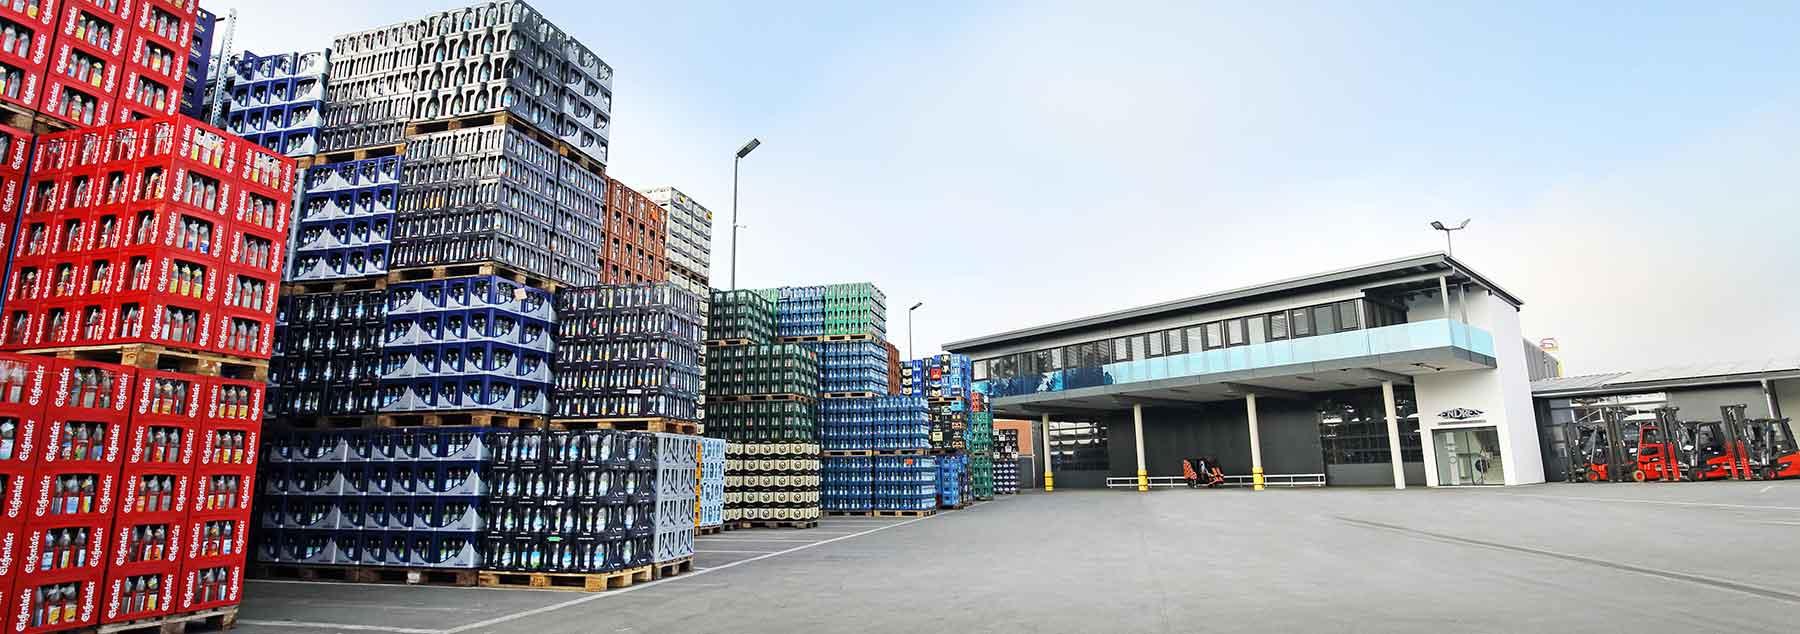 endres-getraenkemarkt-landau-isar-020